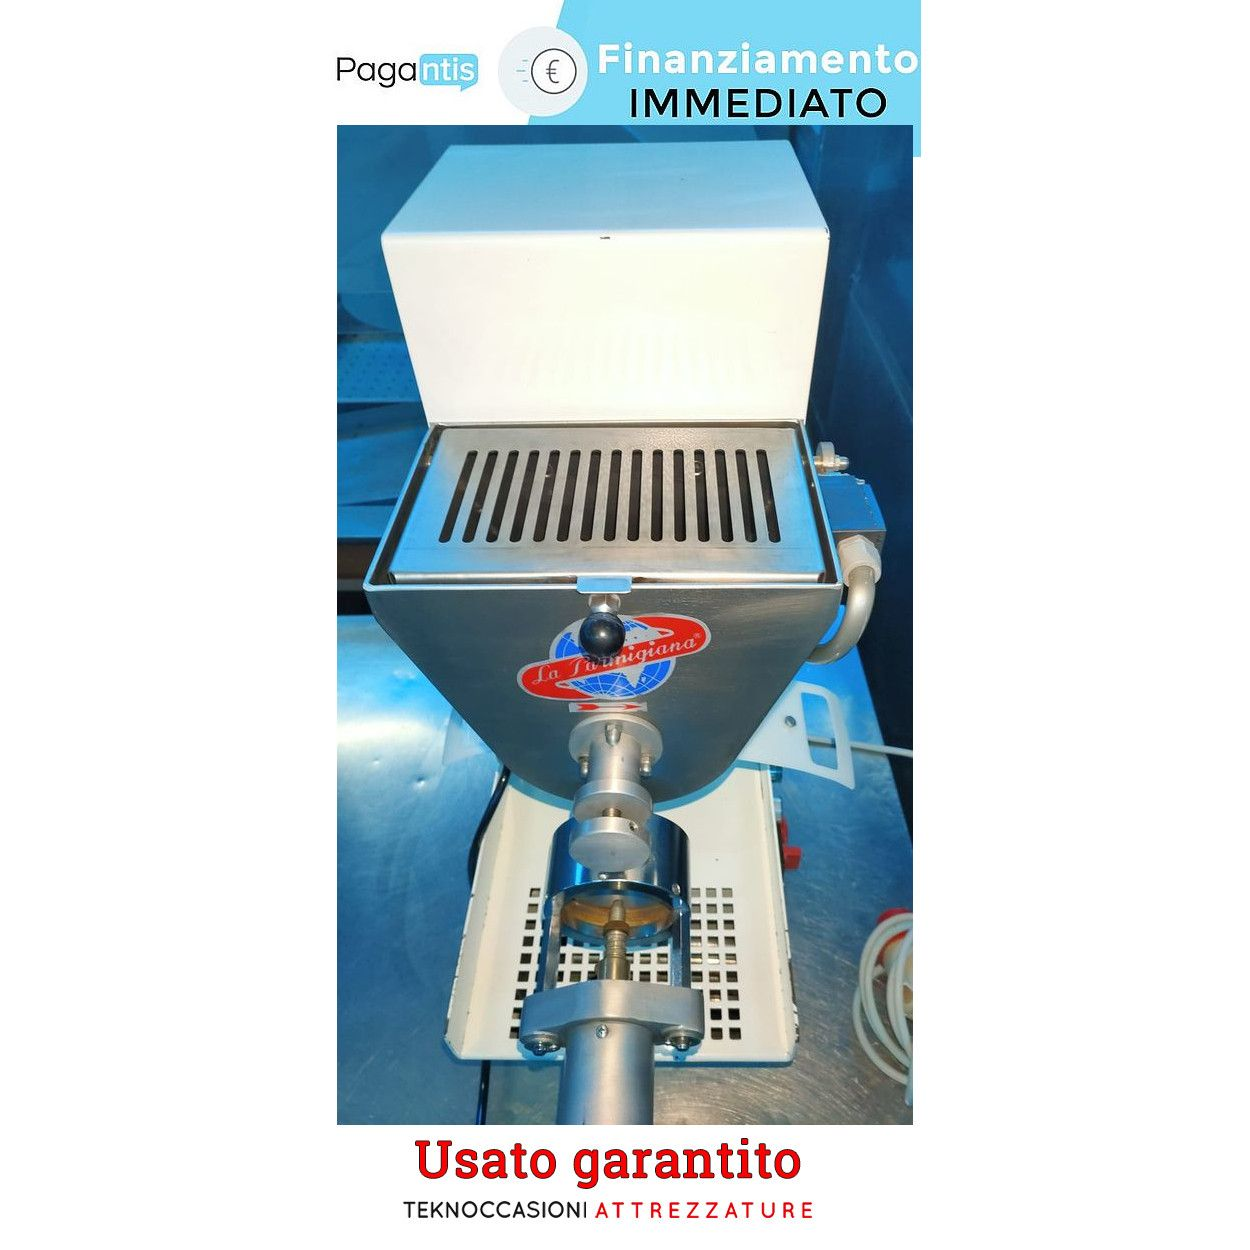 Macchina per pasta fresca la Parmigiana